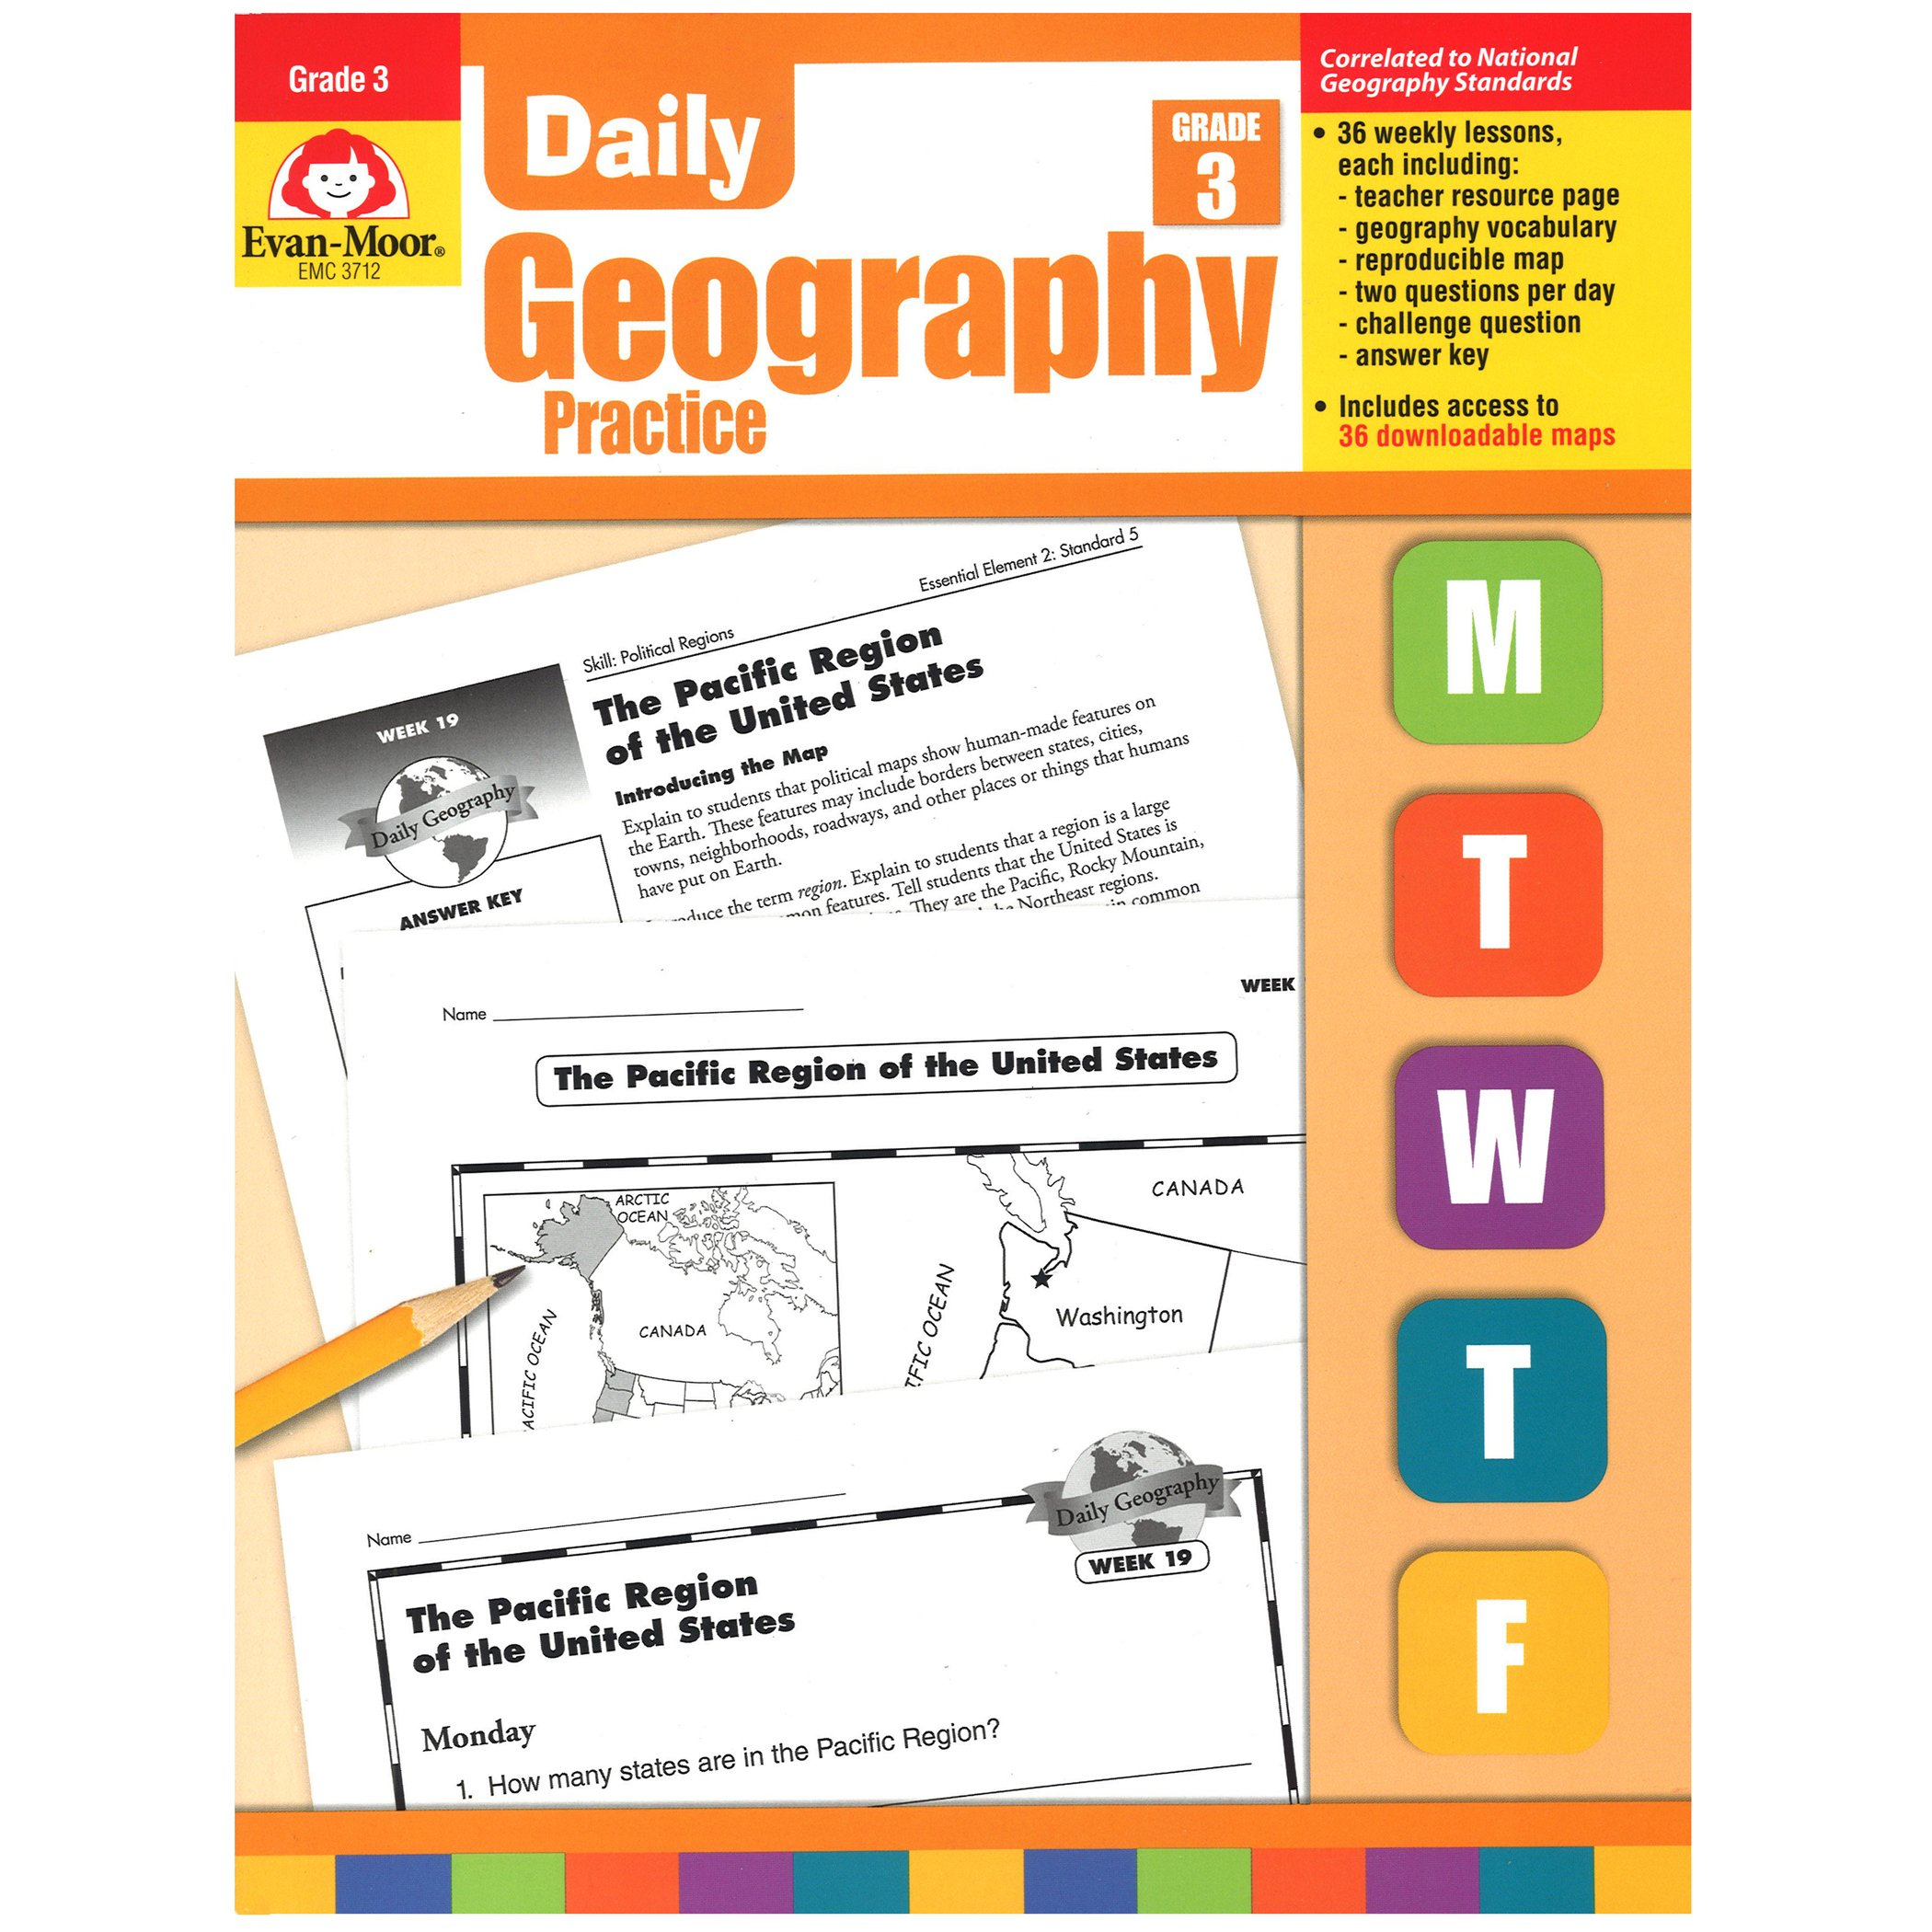 Map Of Canada For Grade 3.Daily Geography Practice Grade 3 Amazon Ca Evan Moor Educational